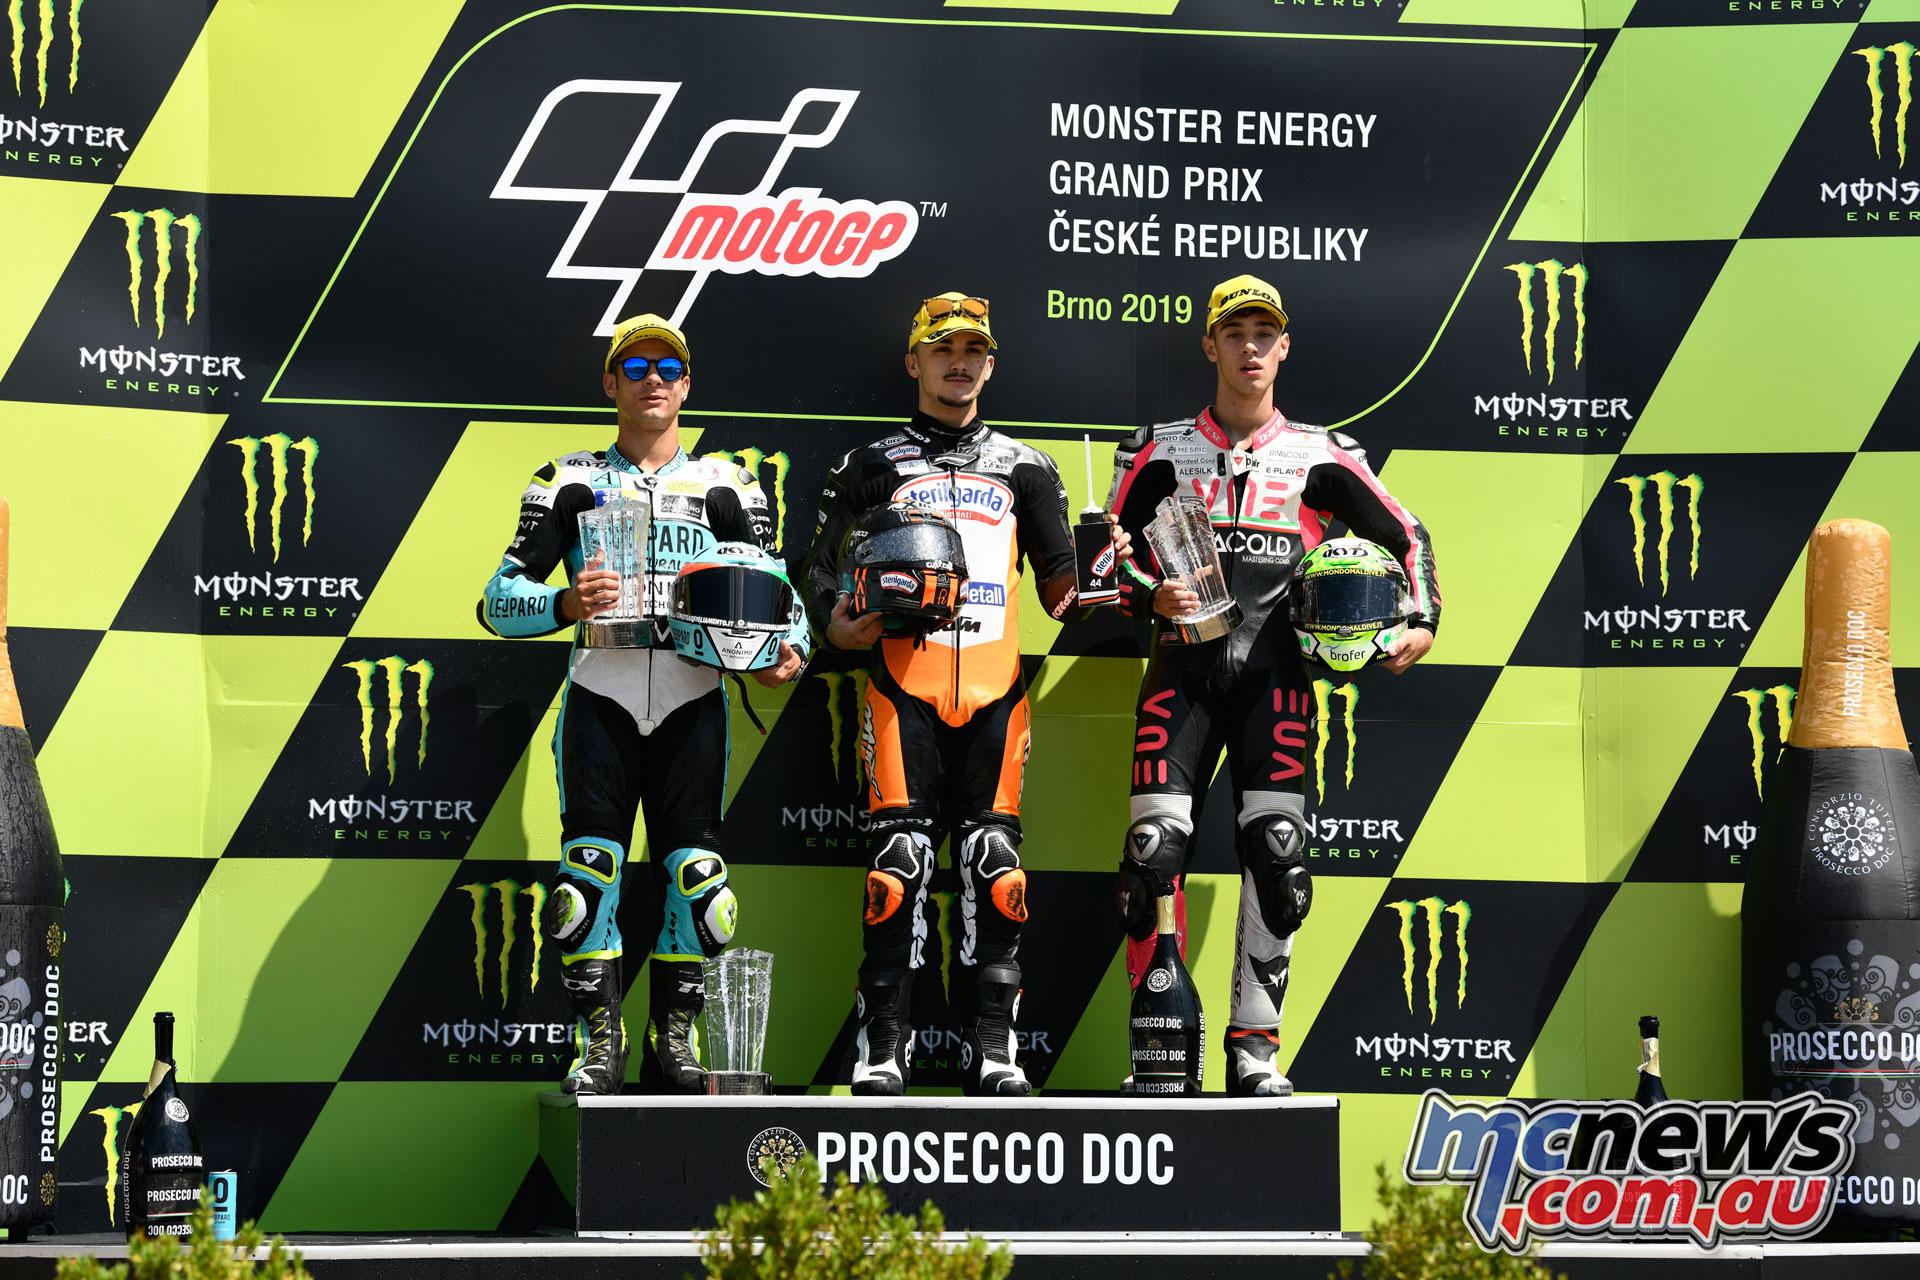 MotoGP Rnd Brno Moto Podium